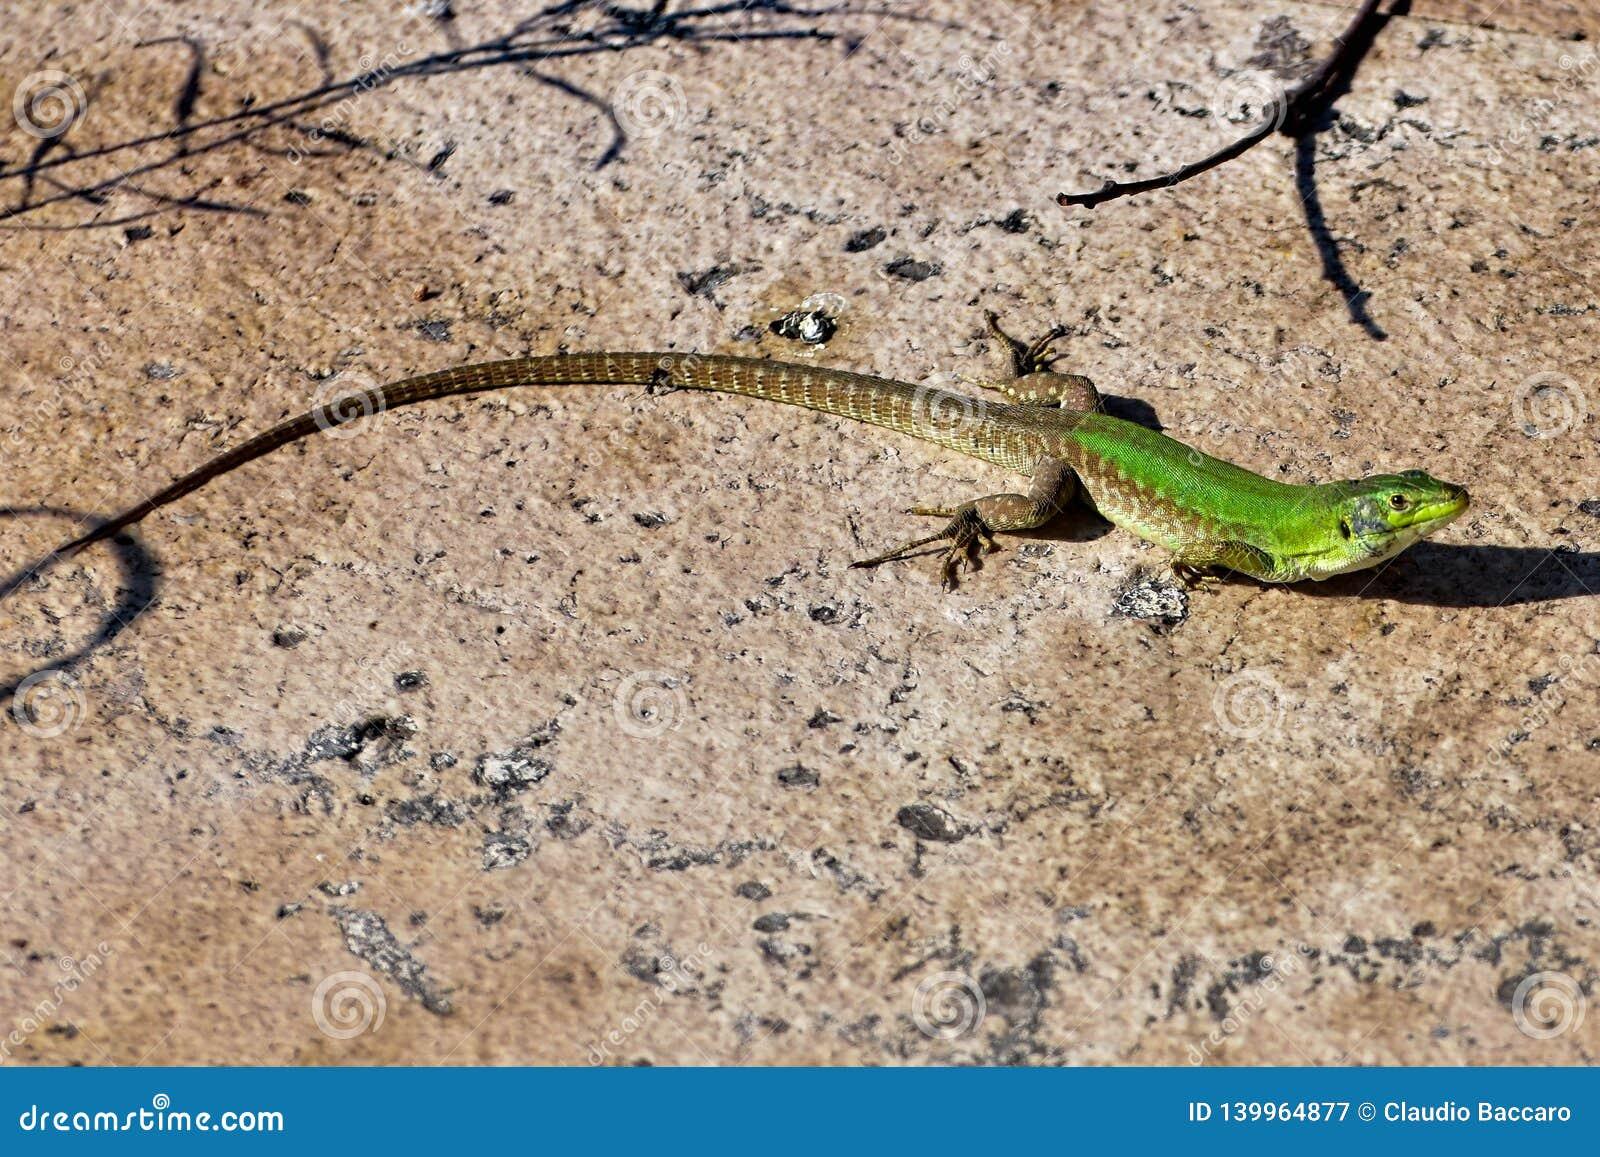 A small green llizard looking